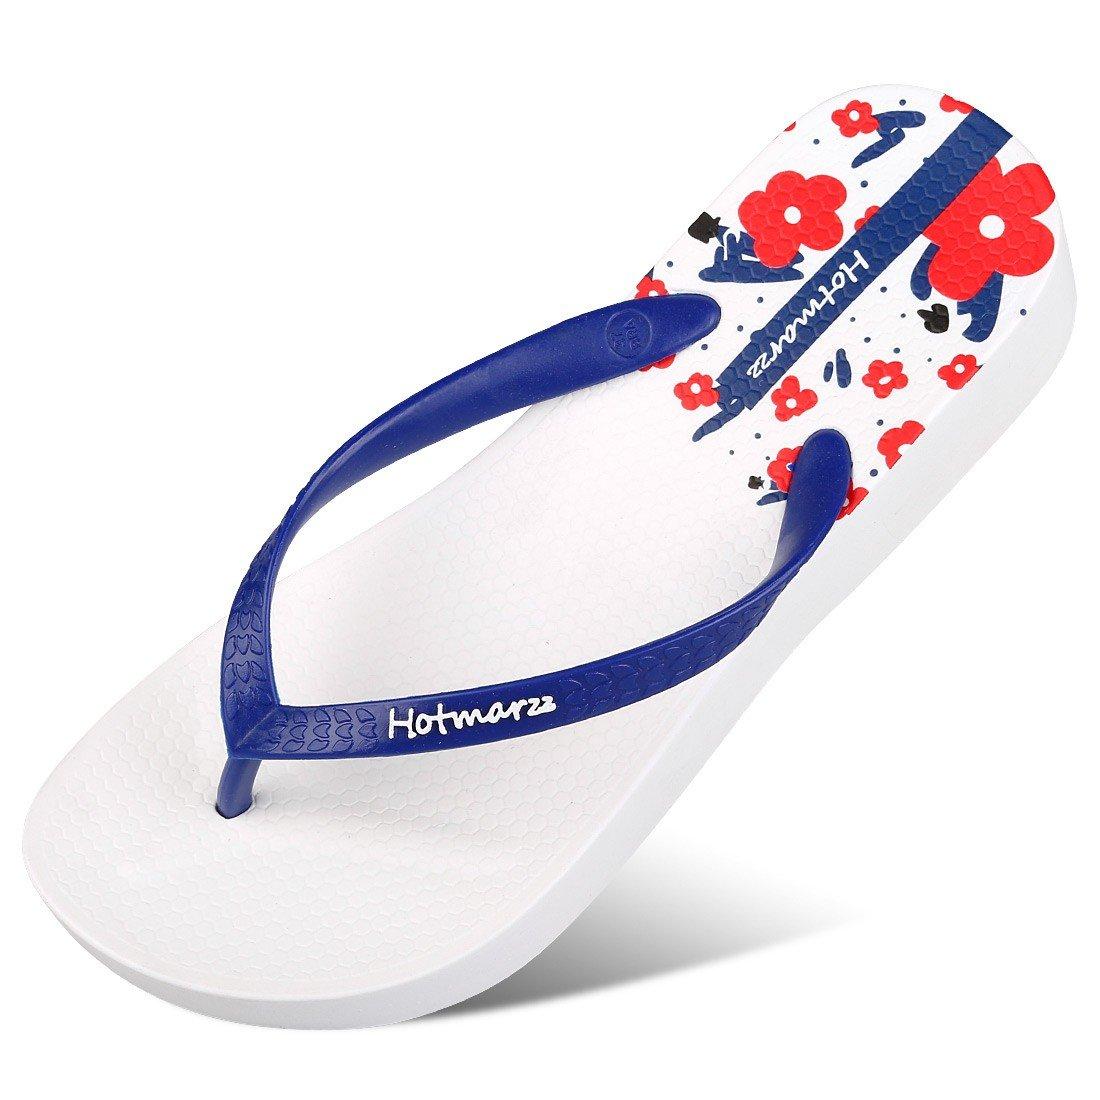 Hotmarzz Women's Fashion High Heel Stylish Platform Flip Flops Wedge Sandals Summer Beach Slippers